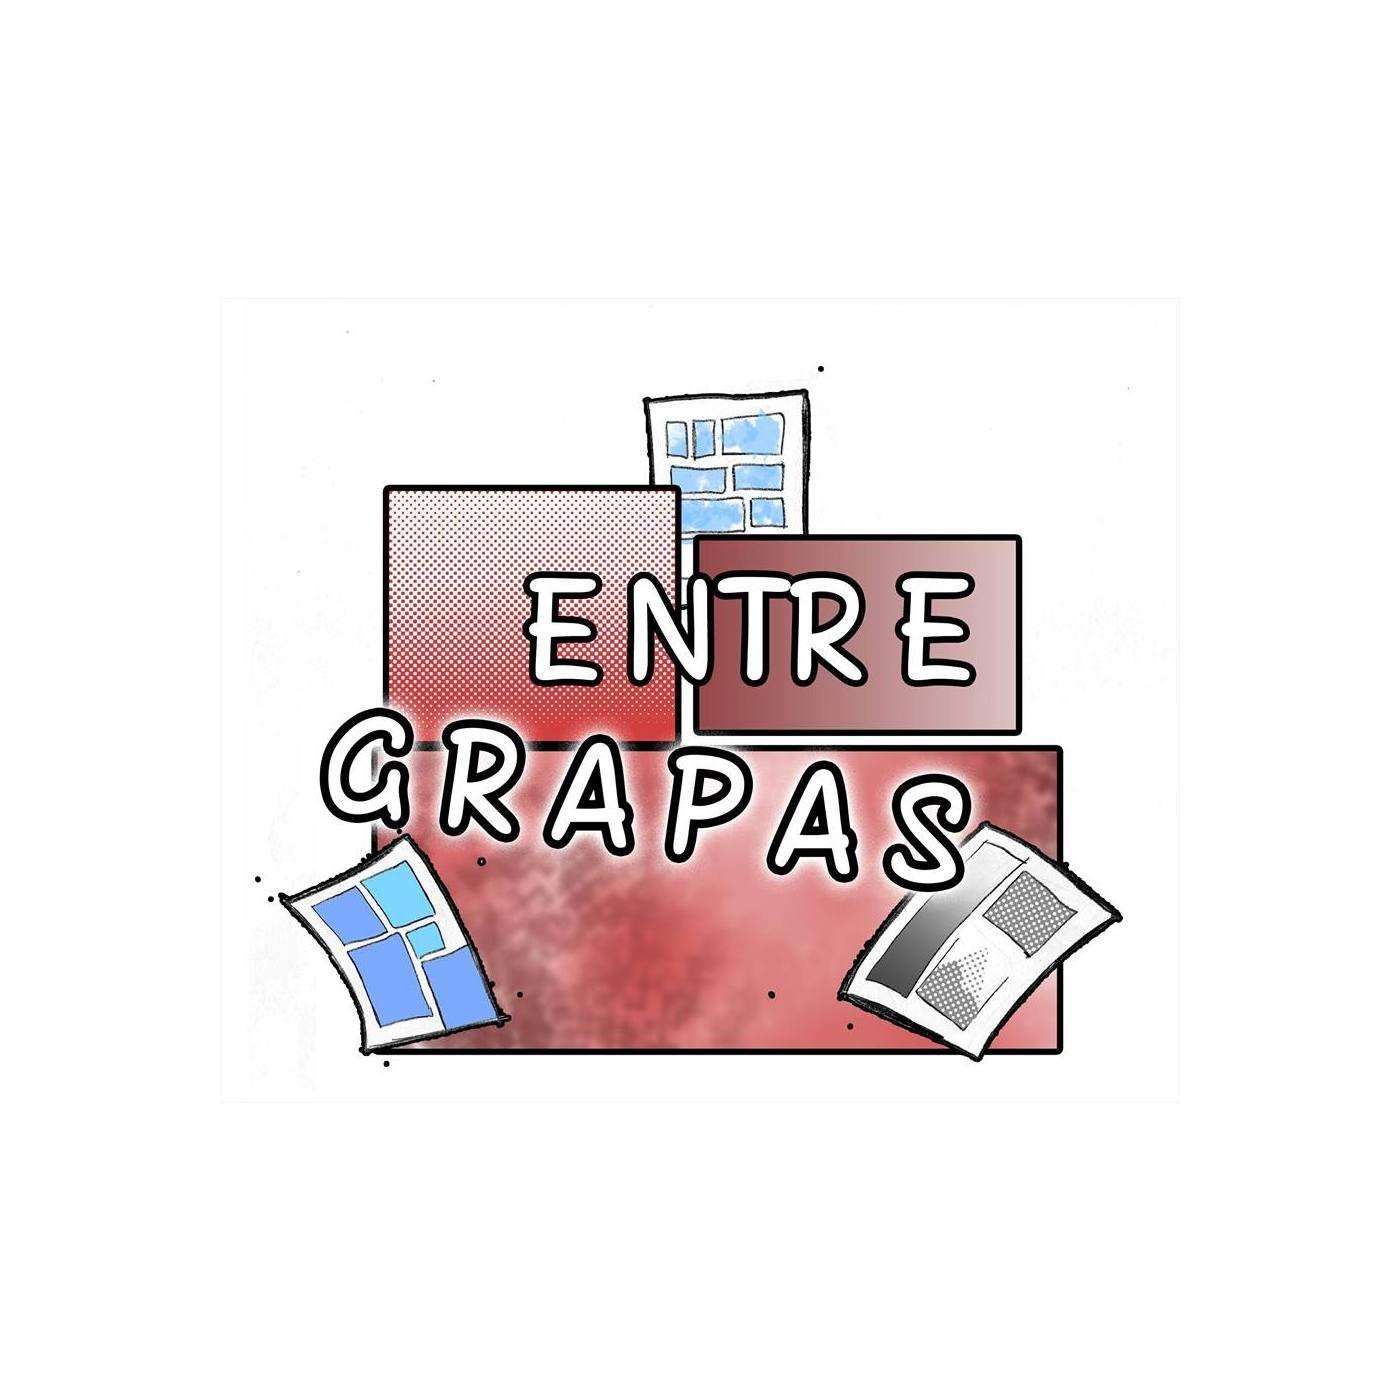 <![CDATA[Entre Grapas]]>